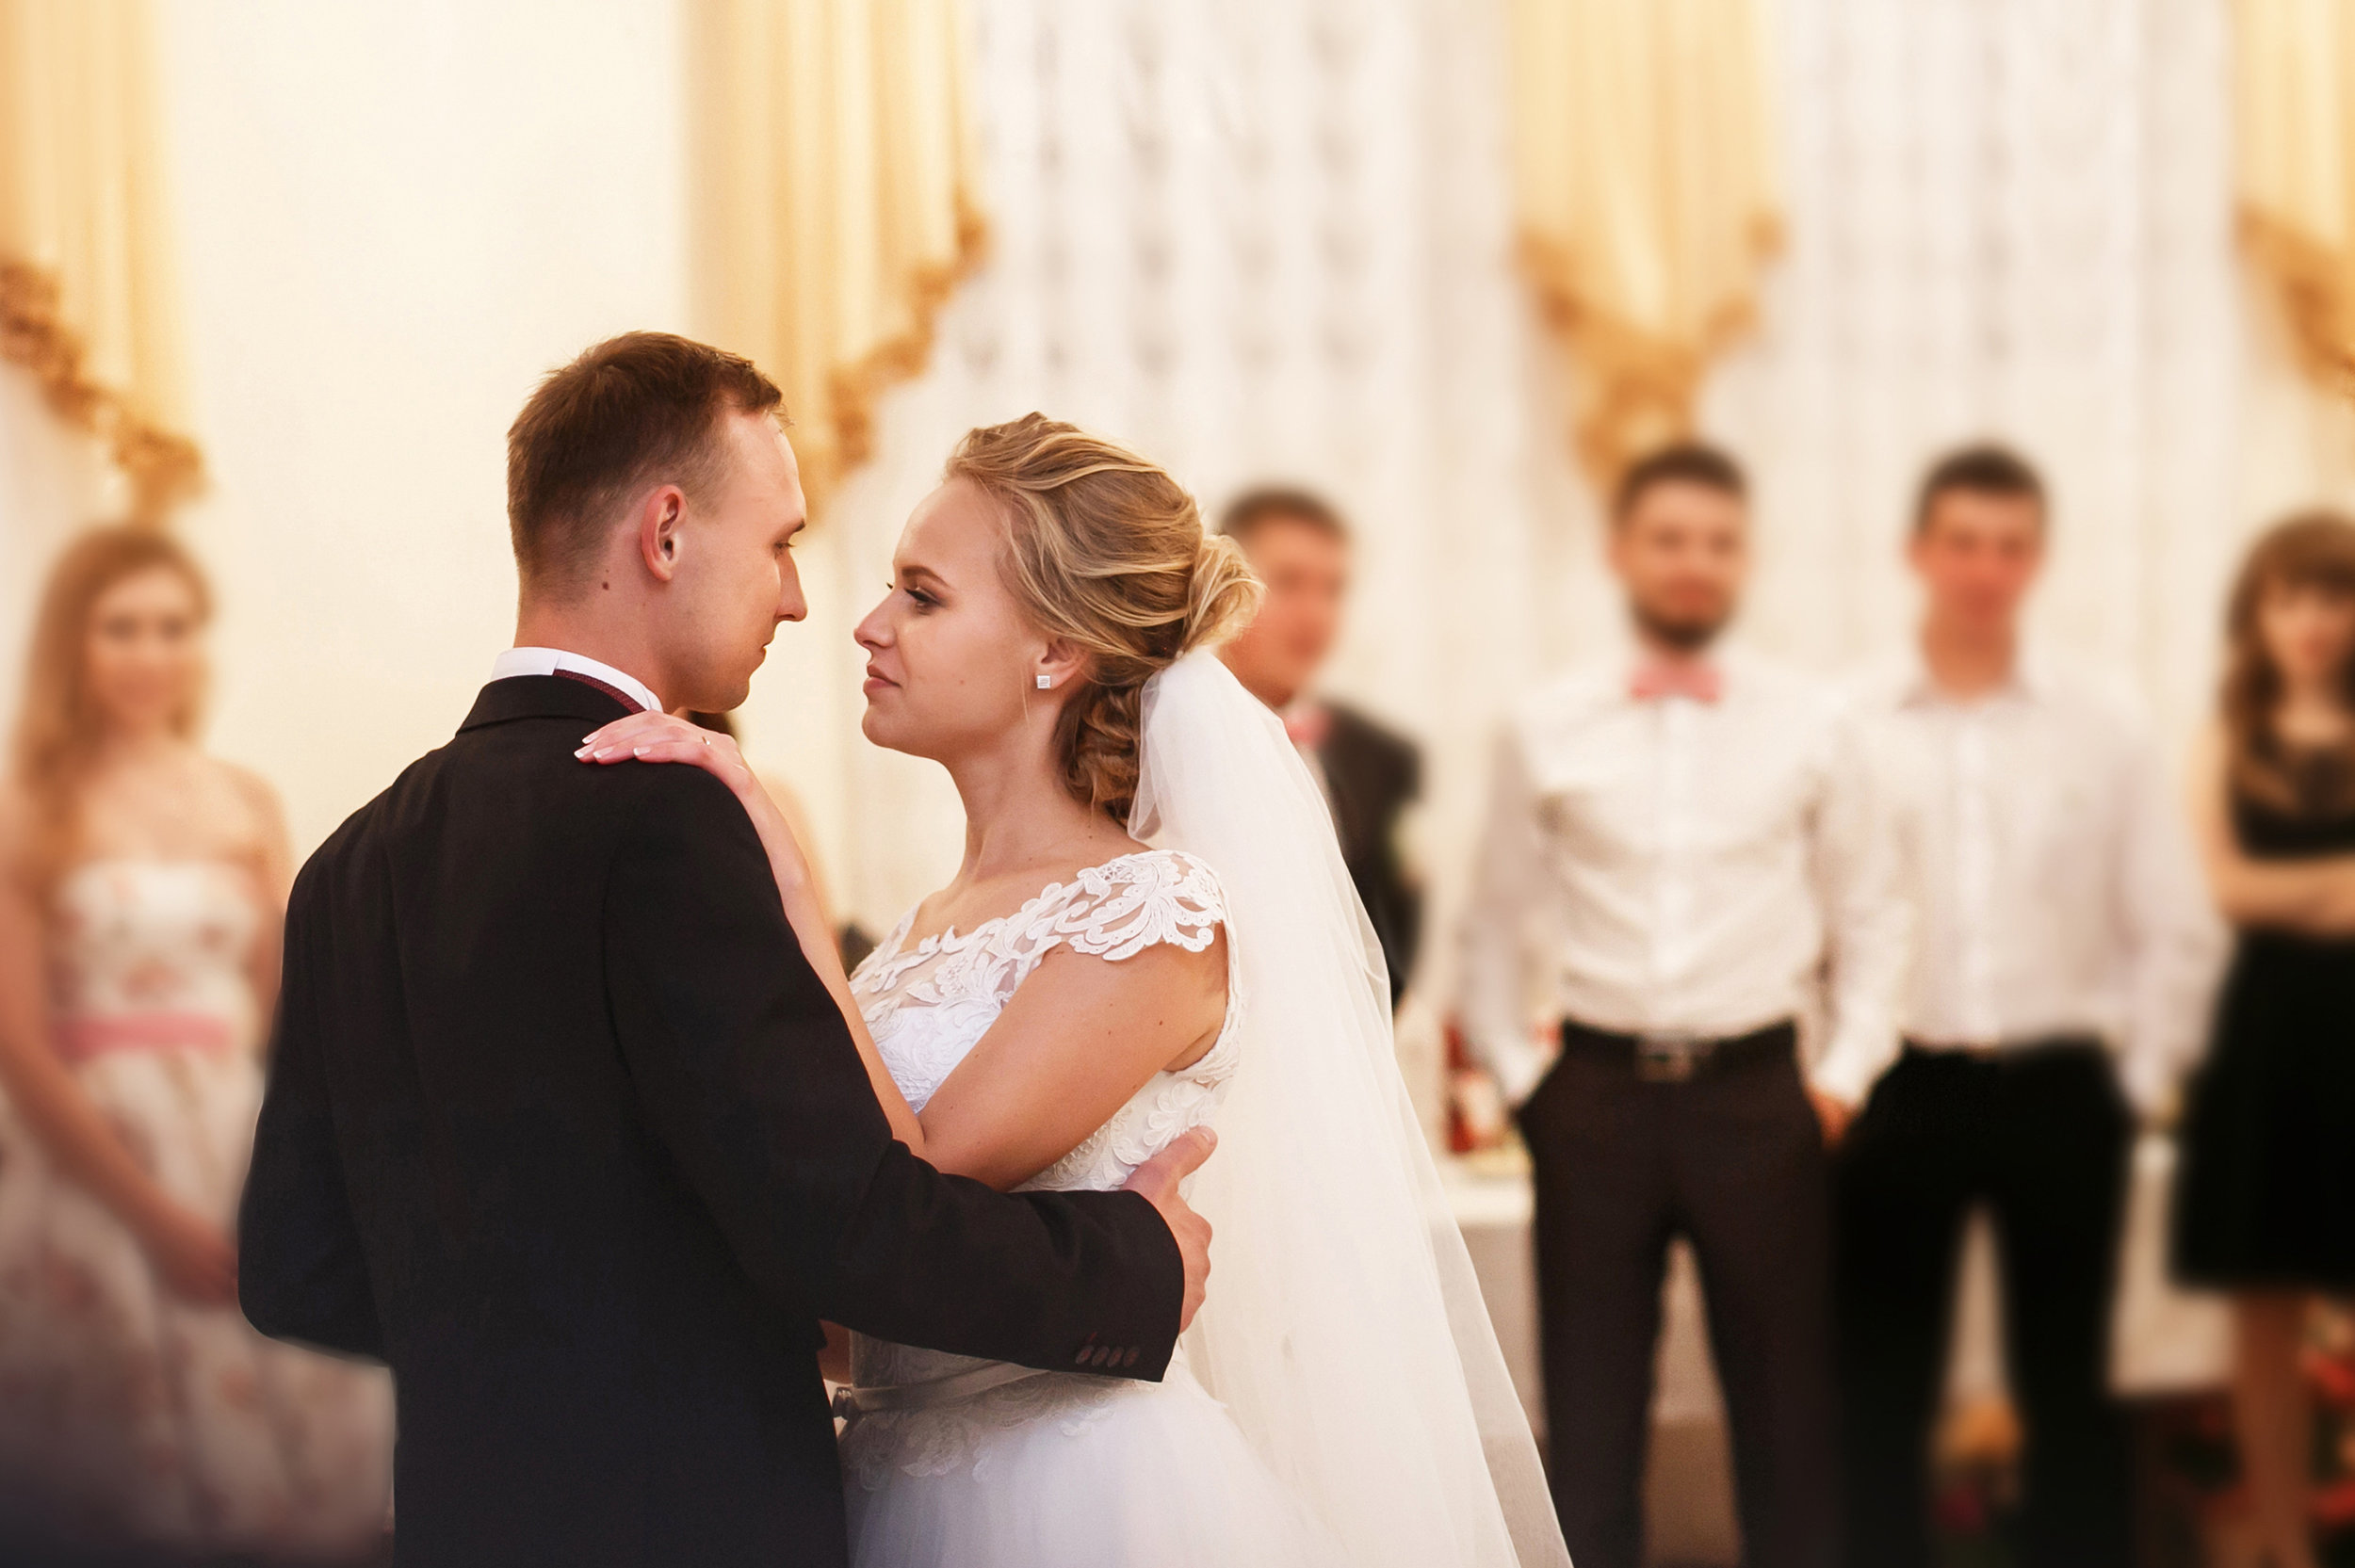 wedding dancers2.jpg